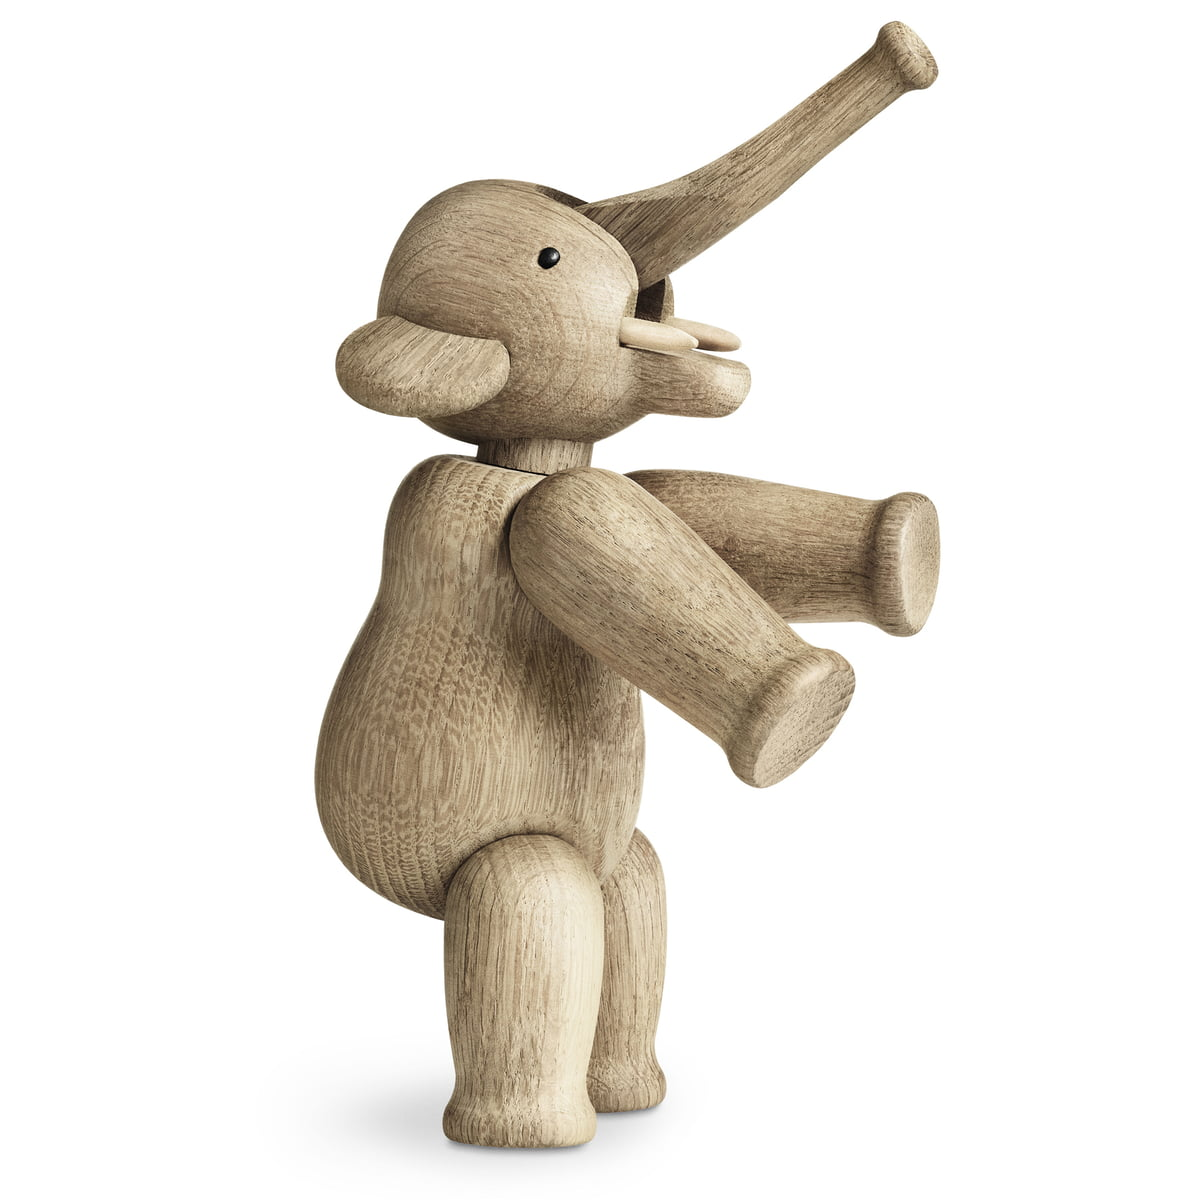 The Wooden Elephant by Kay Bojesen